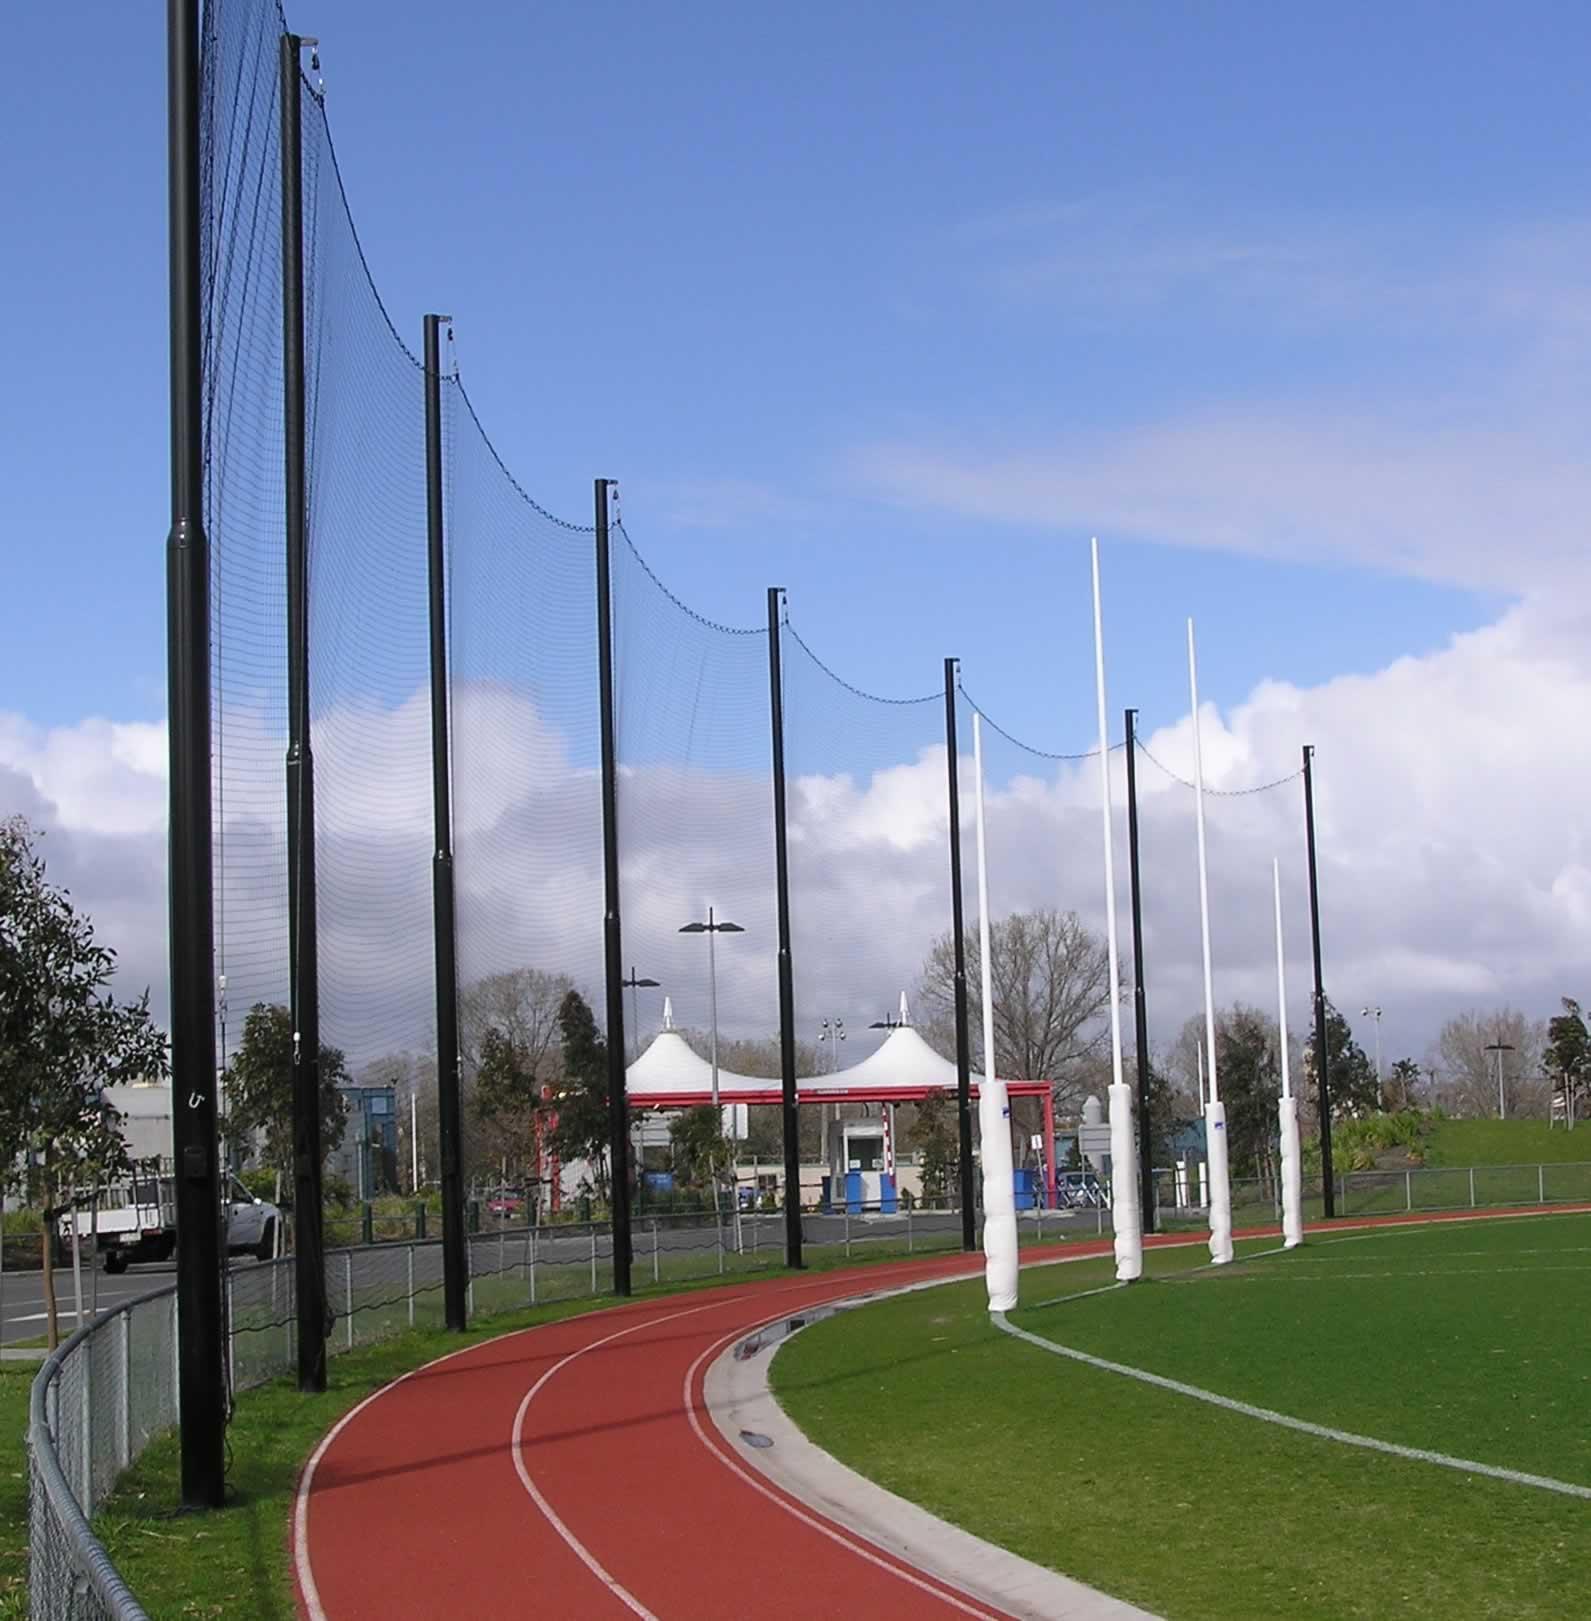 Behind Goal Netting